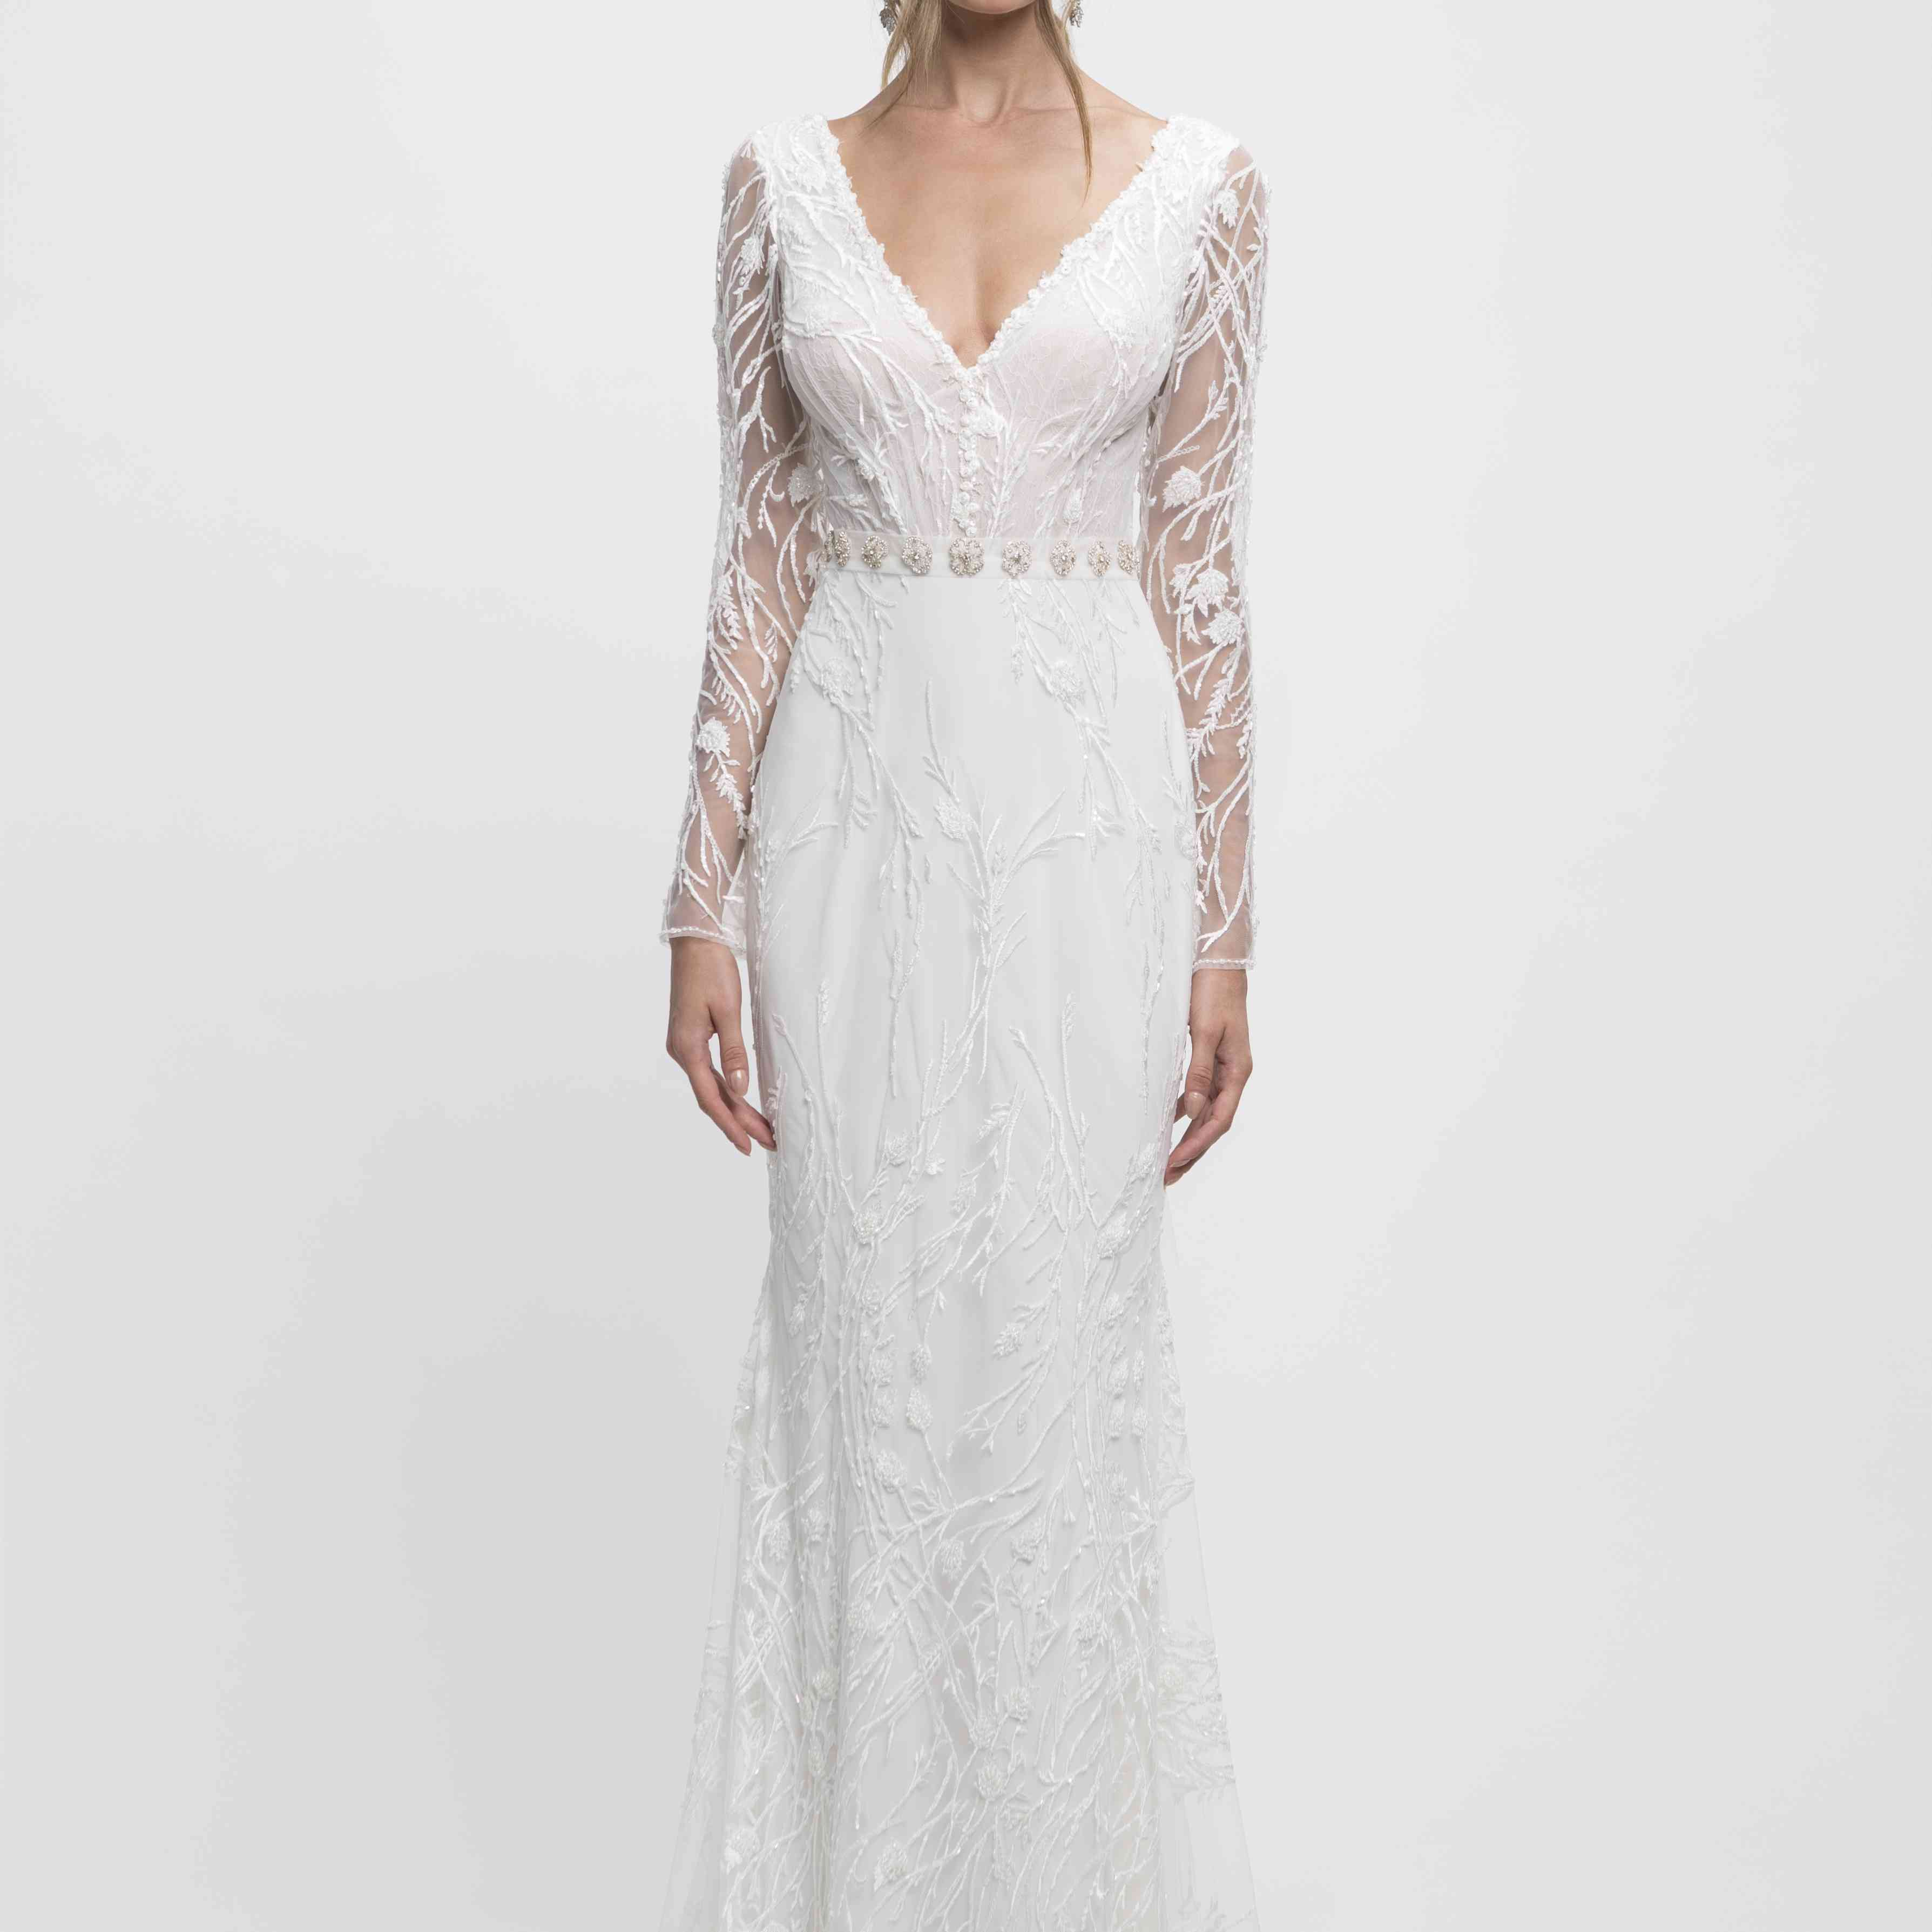 Aya long sleeve wedding dress